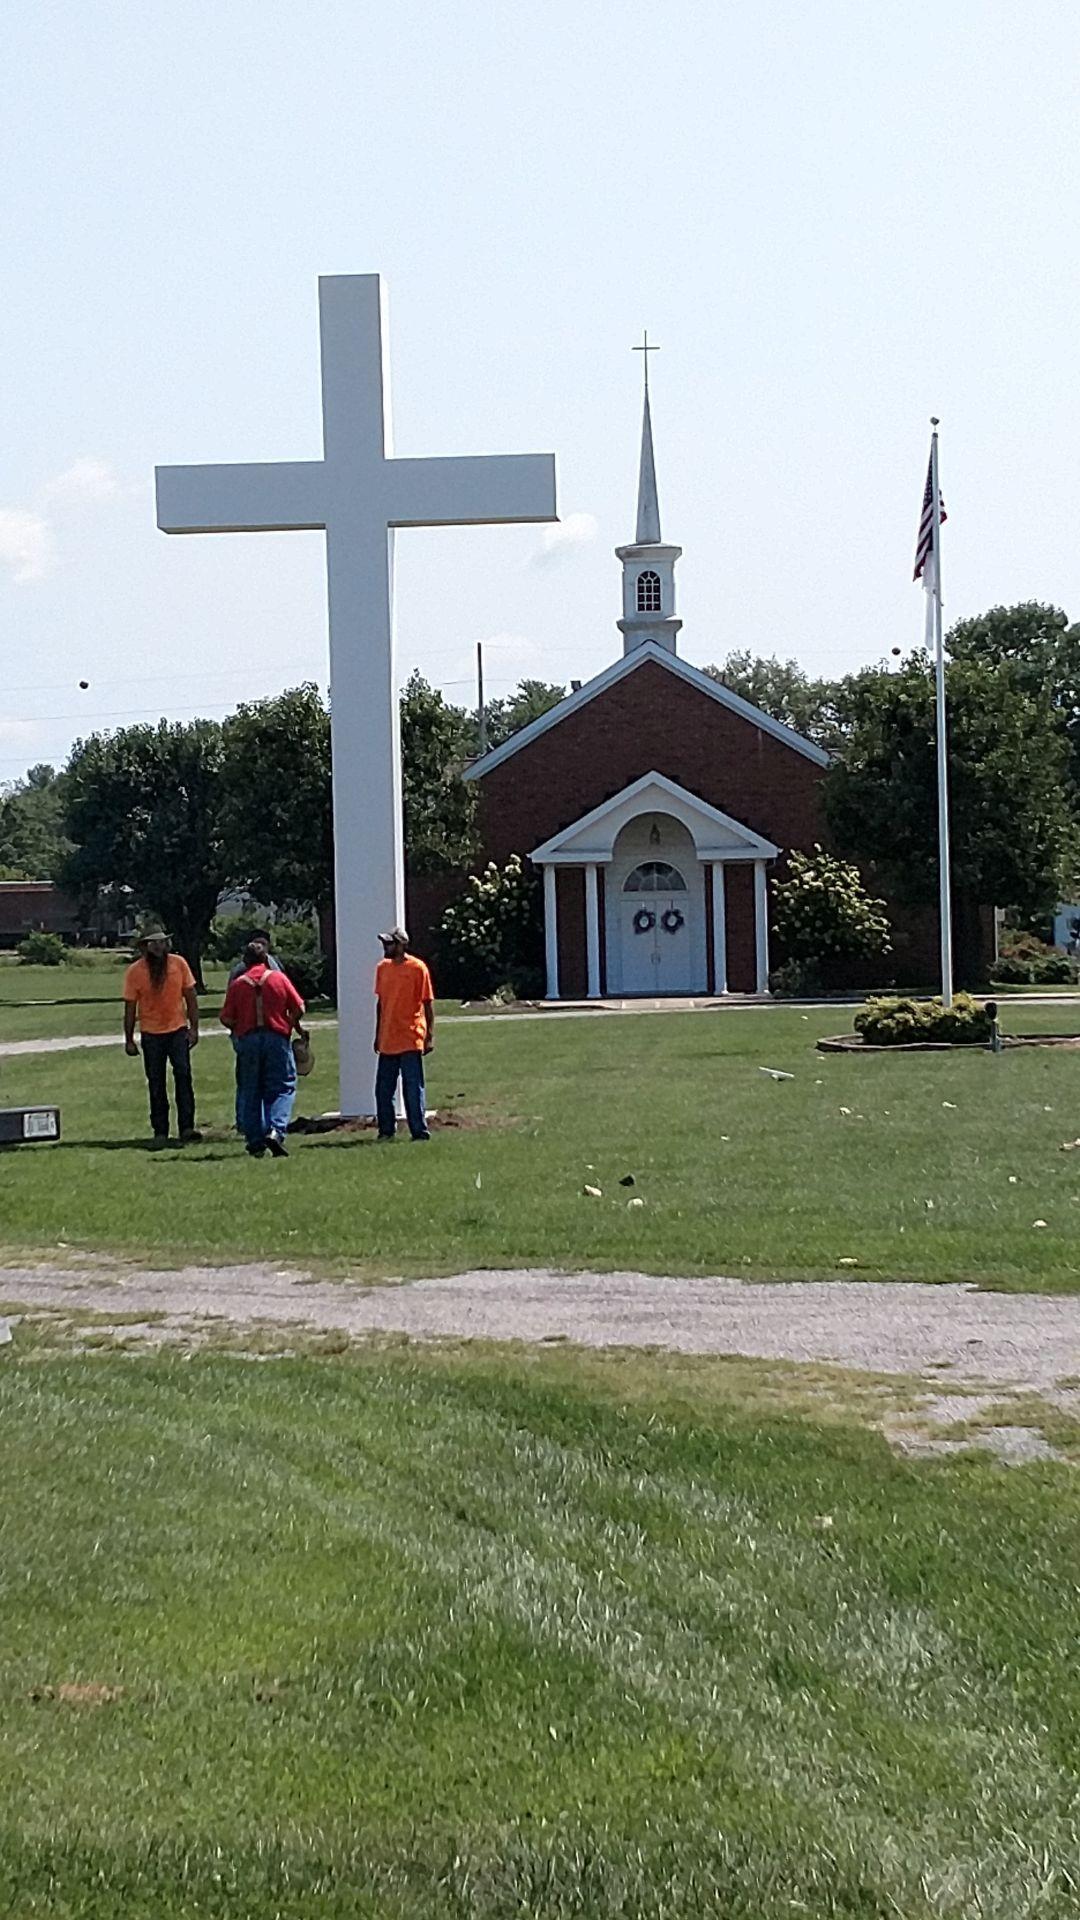 Du Quoin's large cross